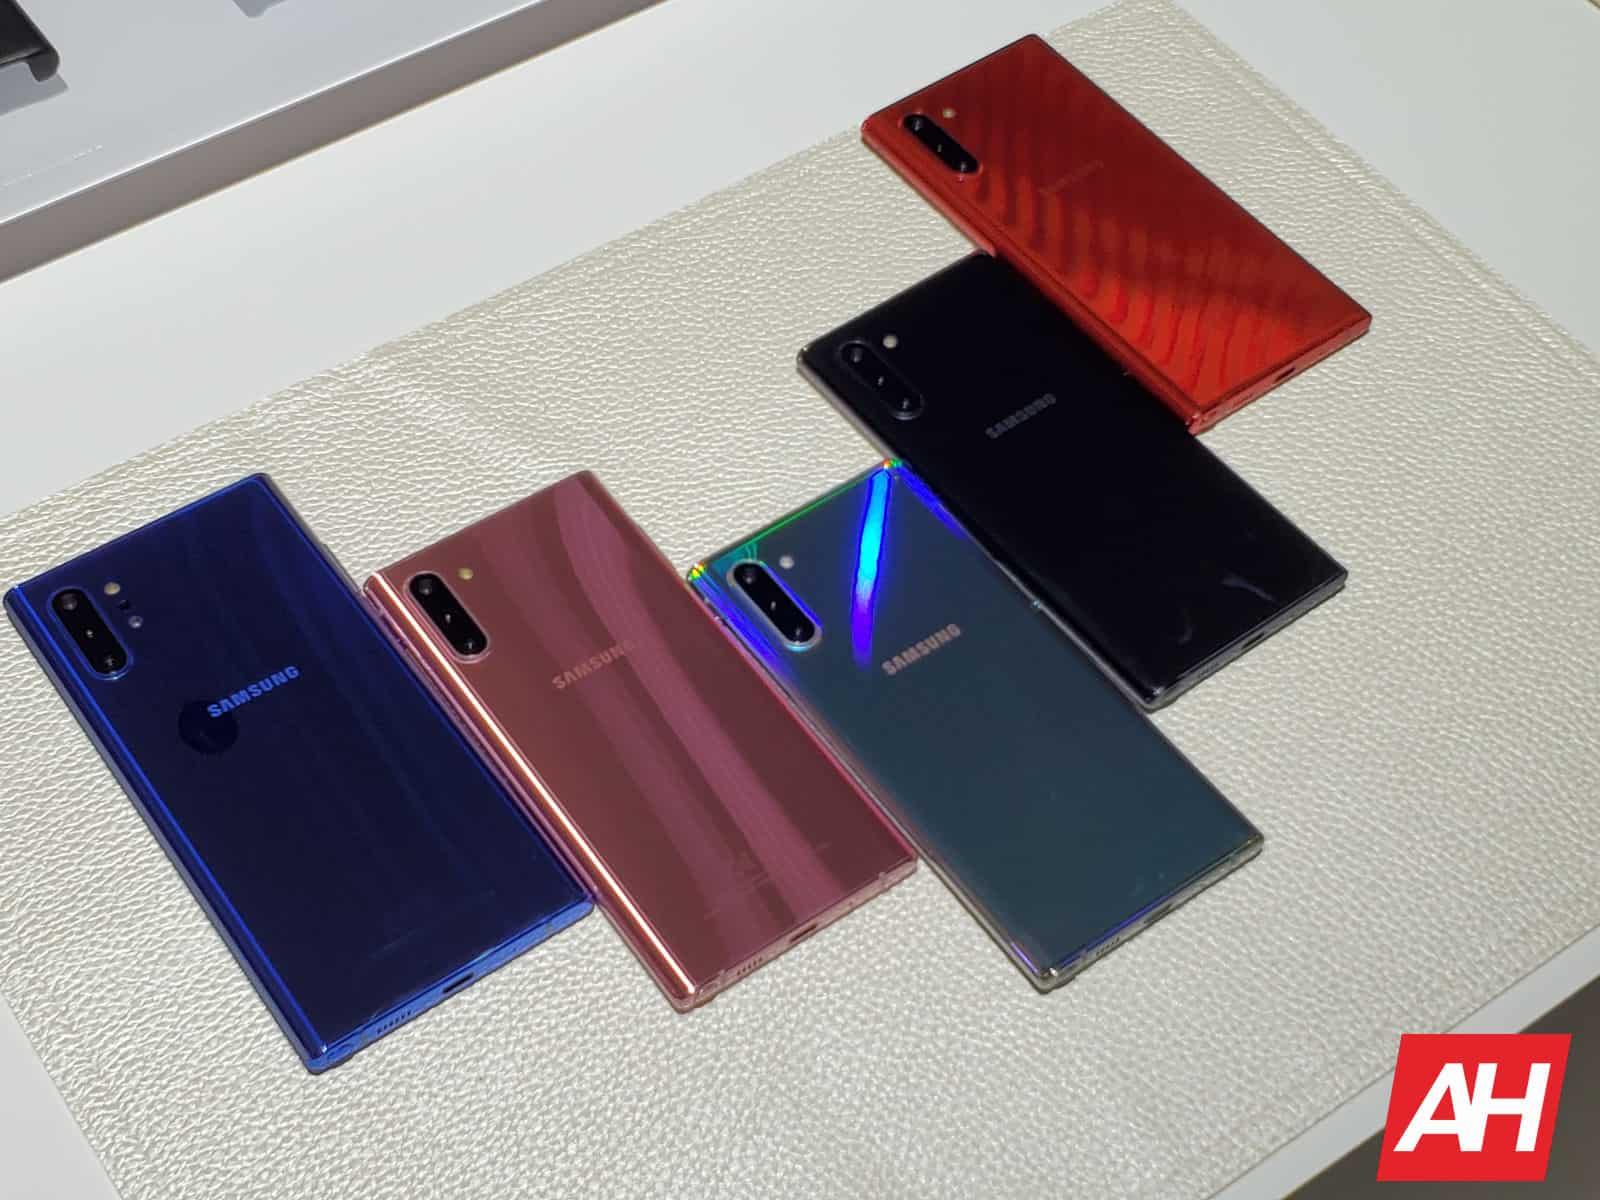 Samsung Galaxy Note 10 Colors AH 2019 16